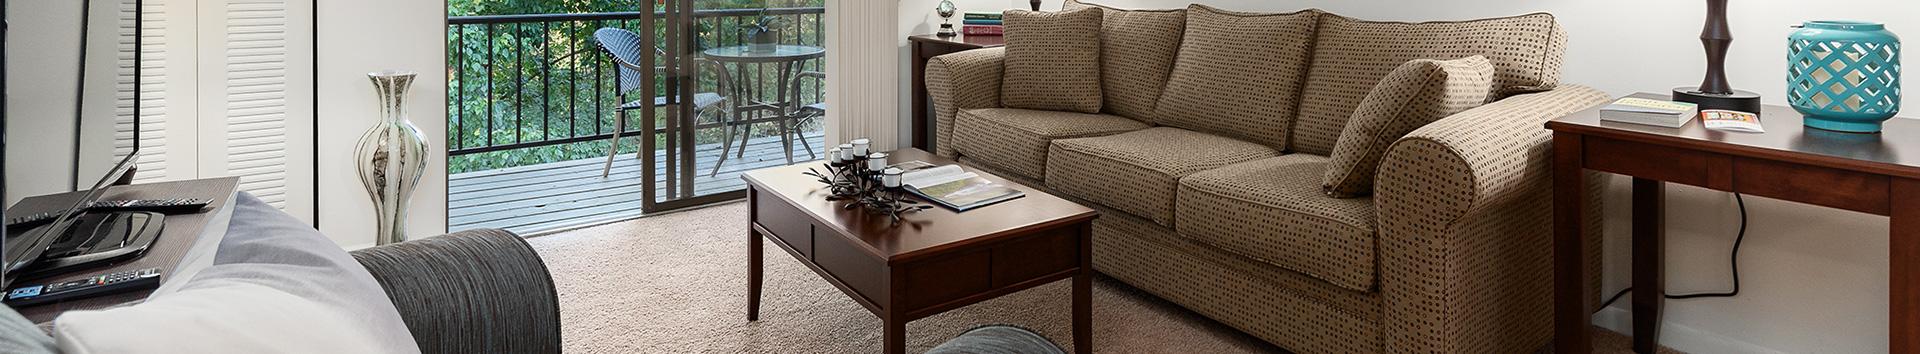 Room Interior view of Roxalana Hills Apartments at Manor Communities, Charleston/West Virginia